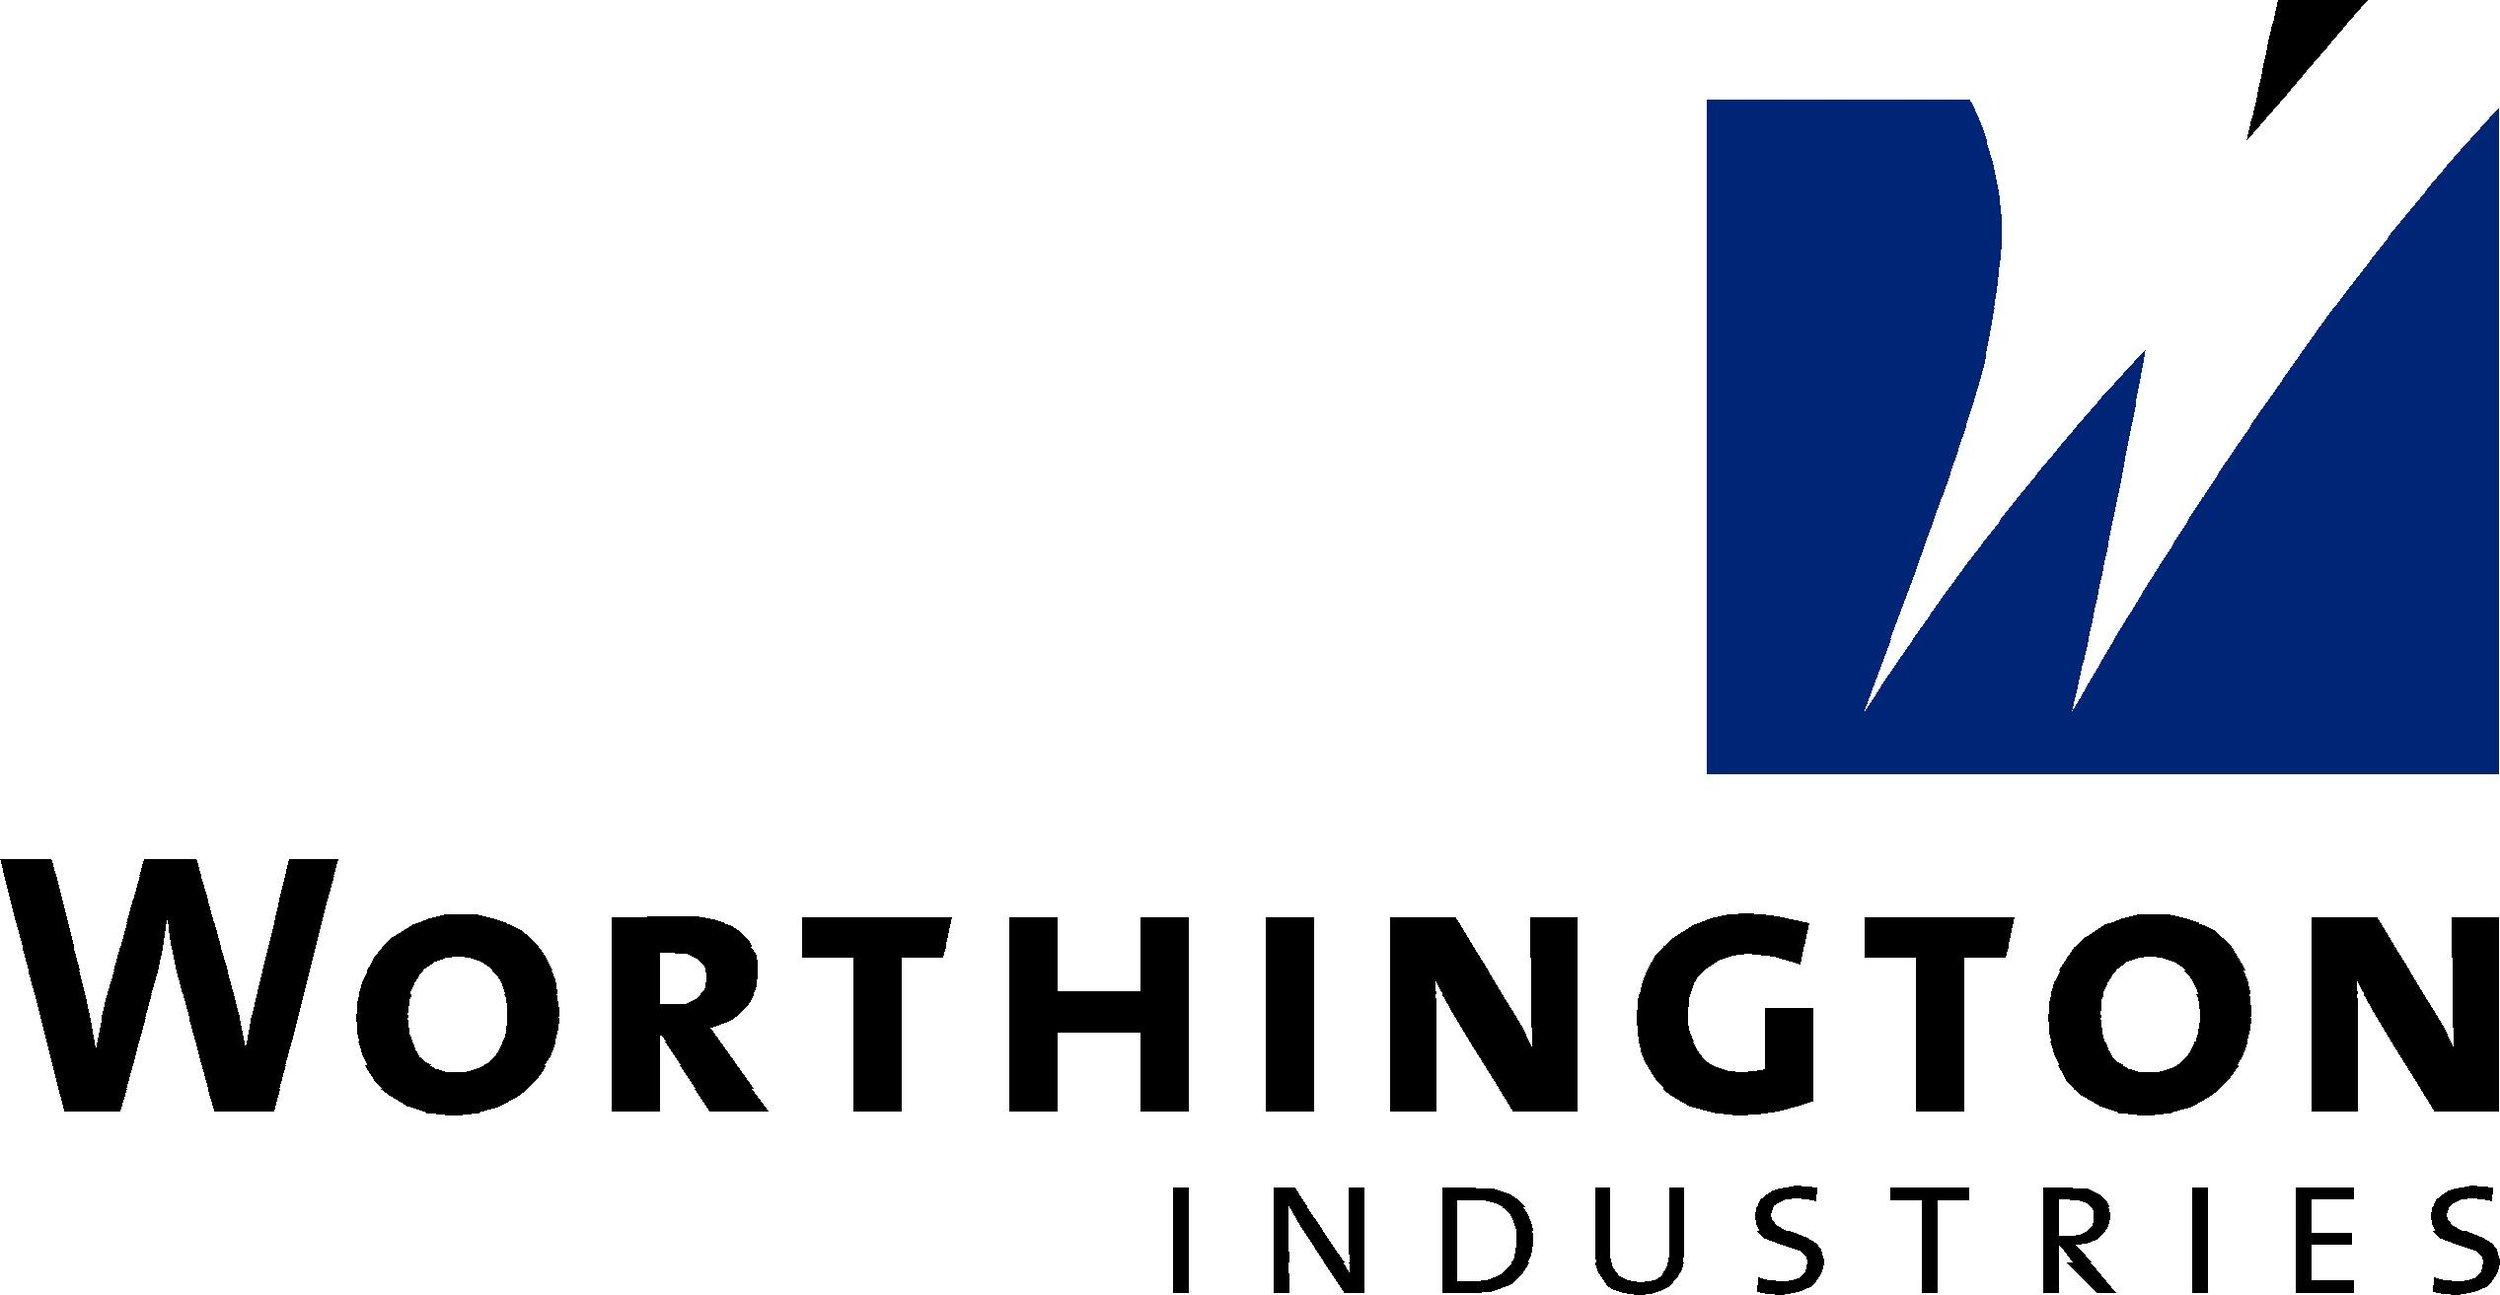 Worthington_Industries.jpg